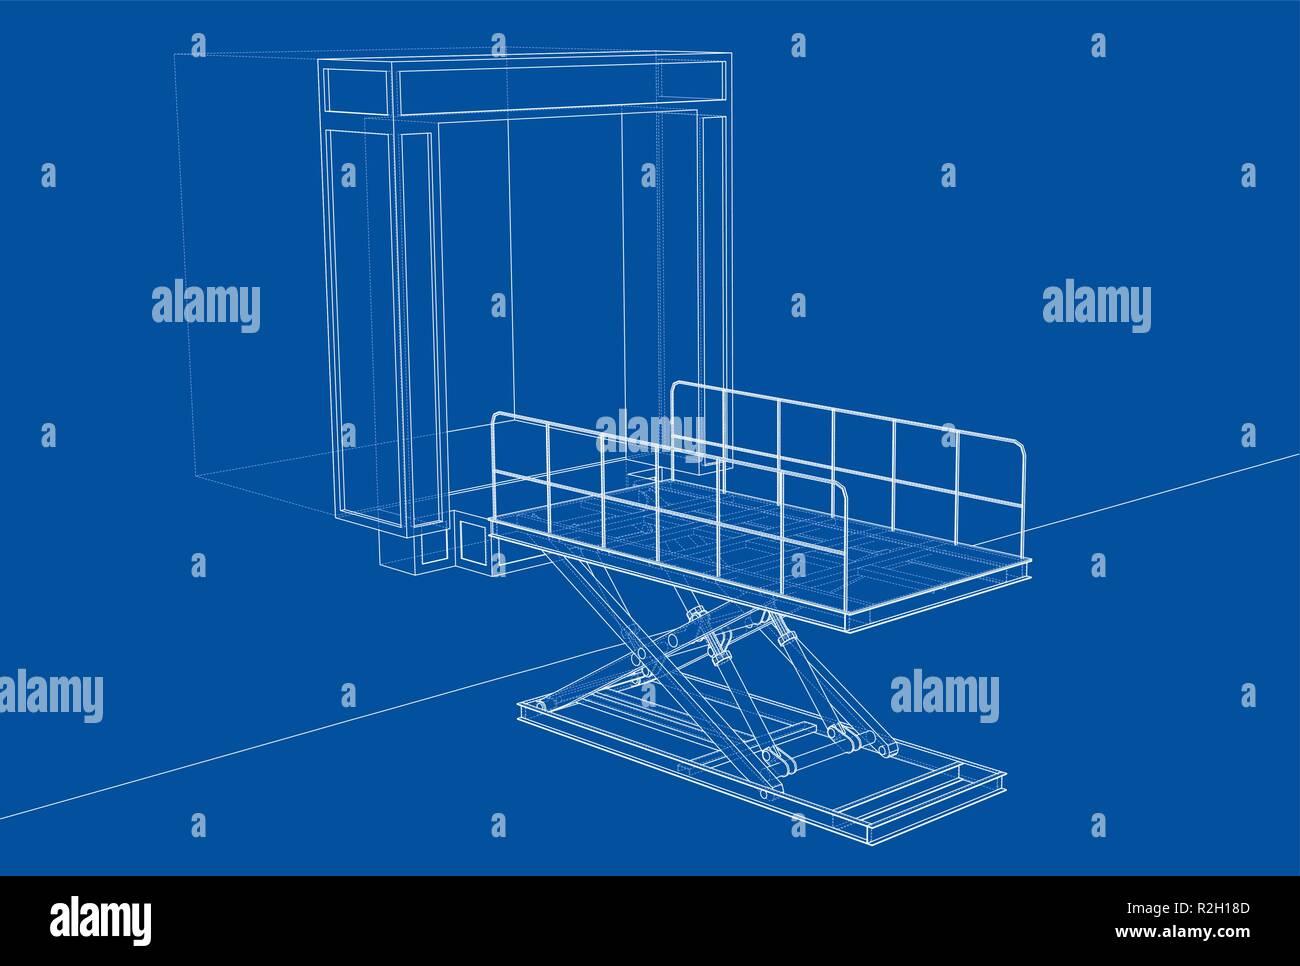 hight resolution of dock leveler concept vector stock image